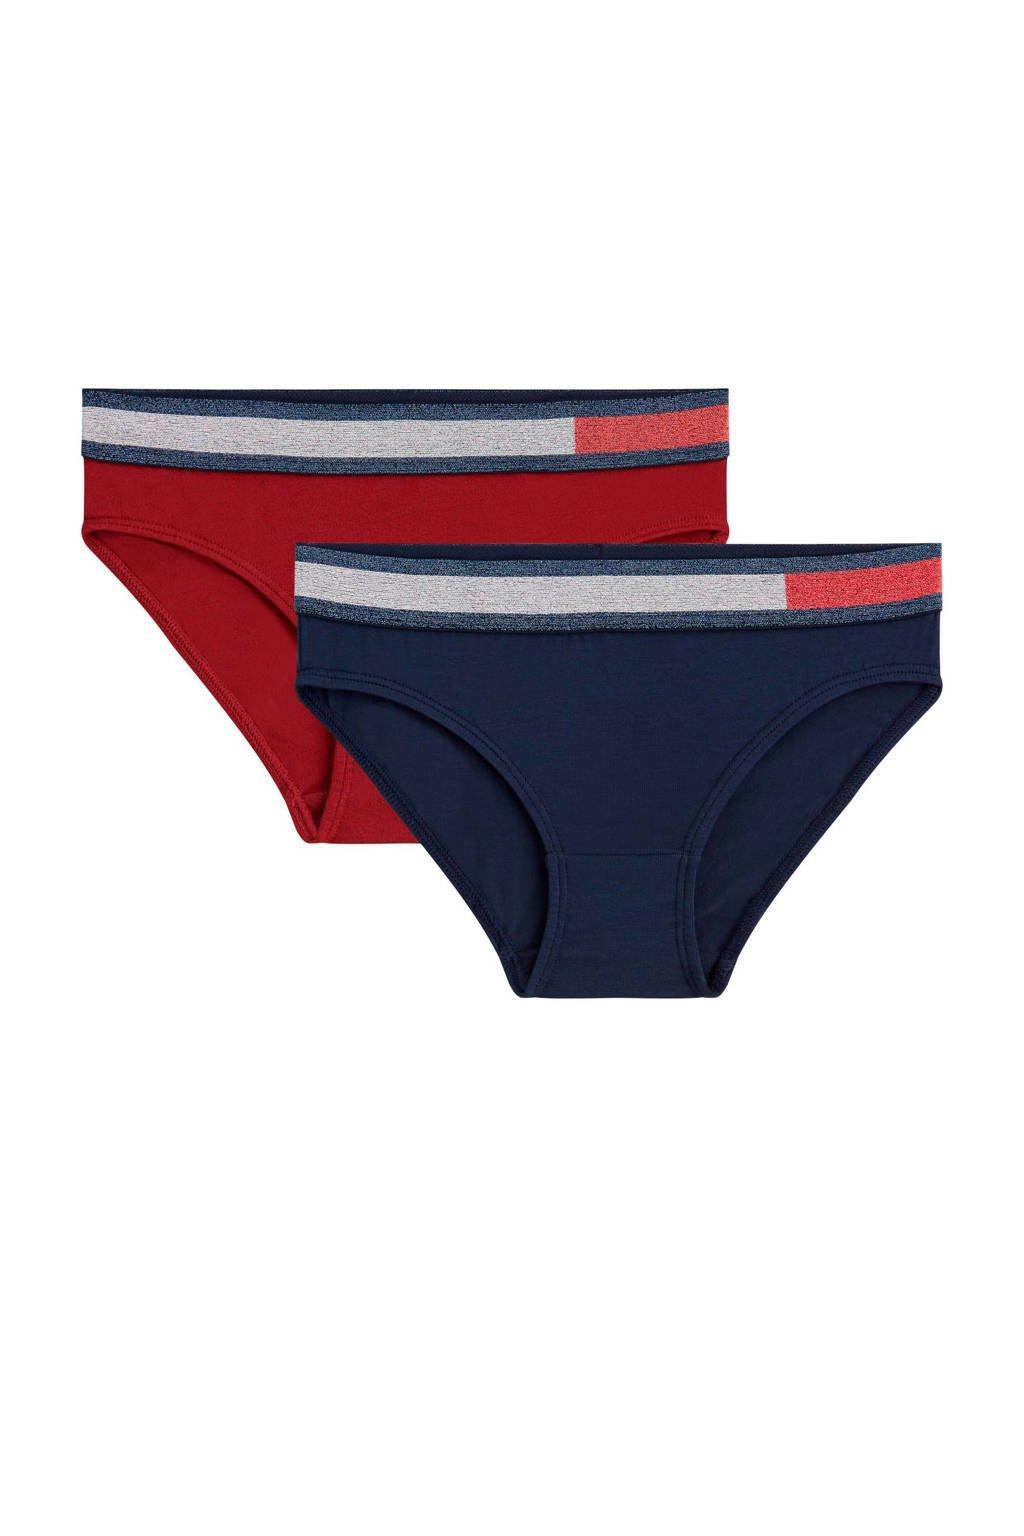 Tommy Hilfiger bikini slip - set van 2 donkerblauw/rood, Donkerblauw/rood